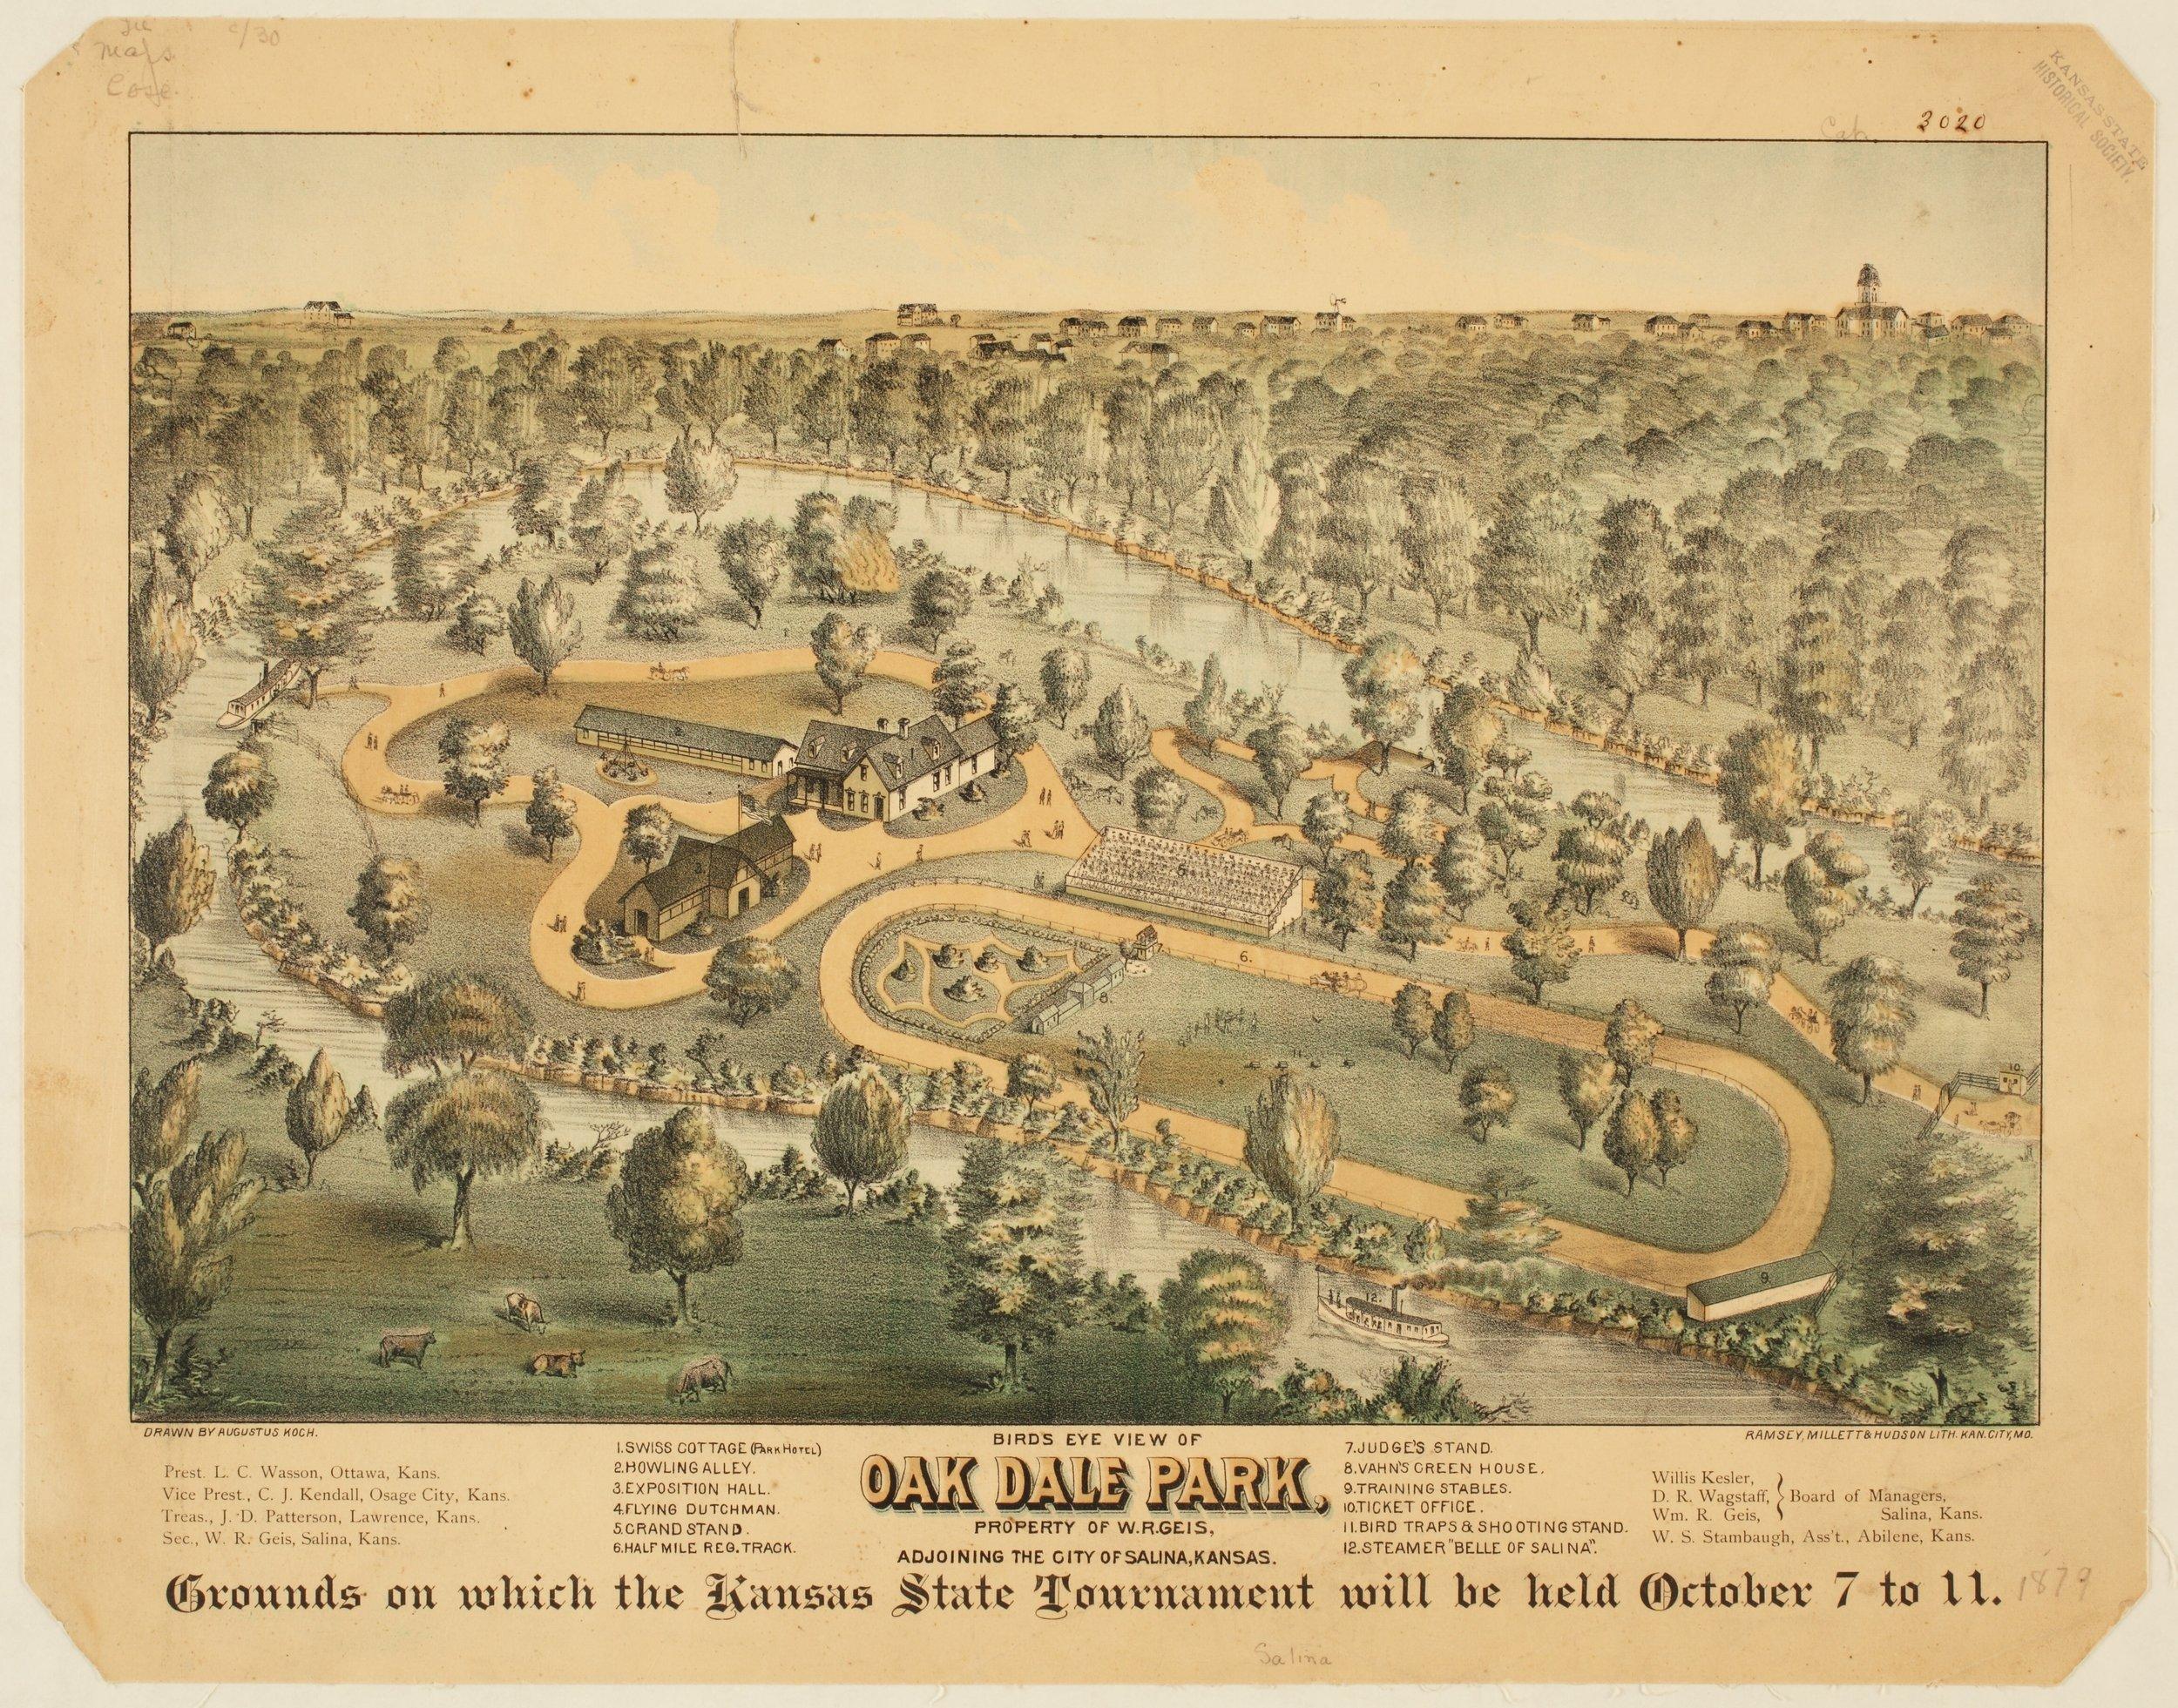 Bird's eye view of Oak Dale Park, Salina, Kansas